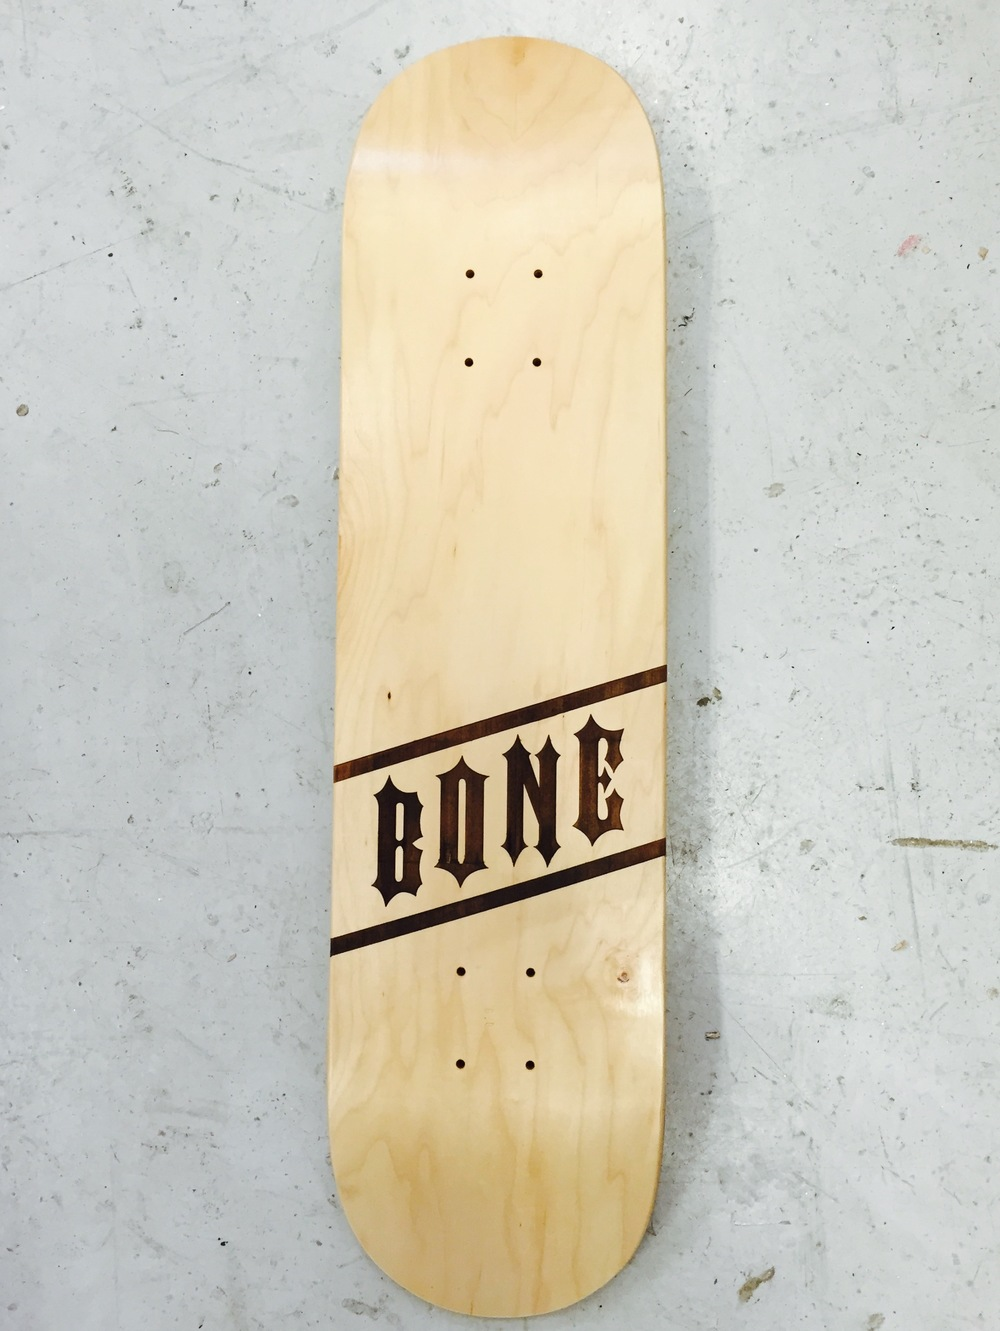 CRIGHTON BONE